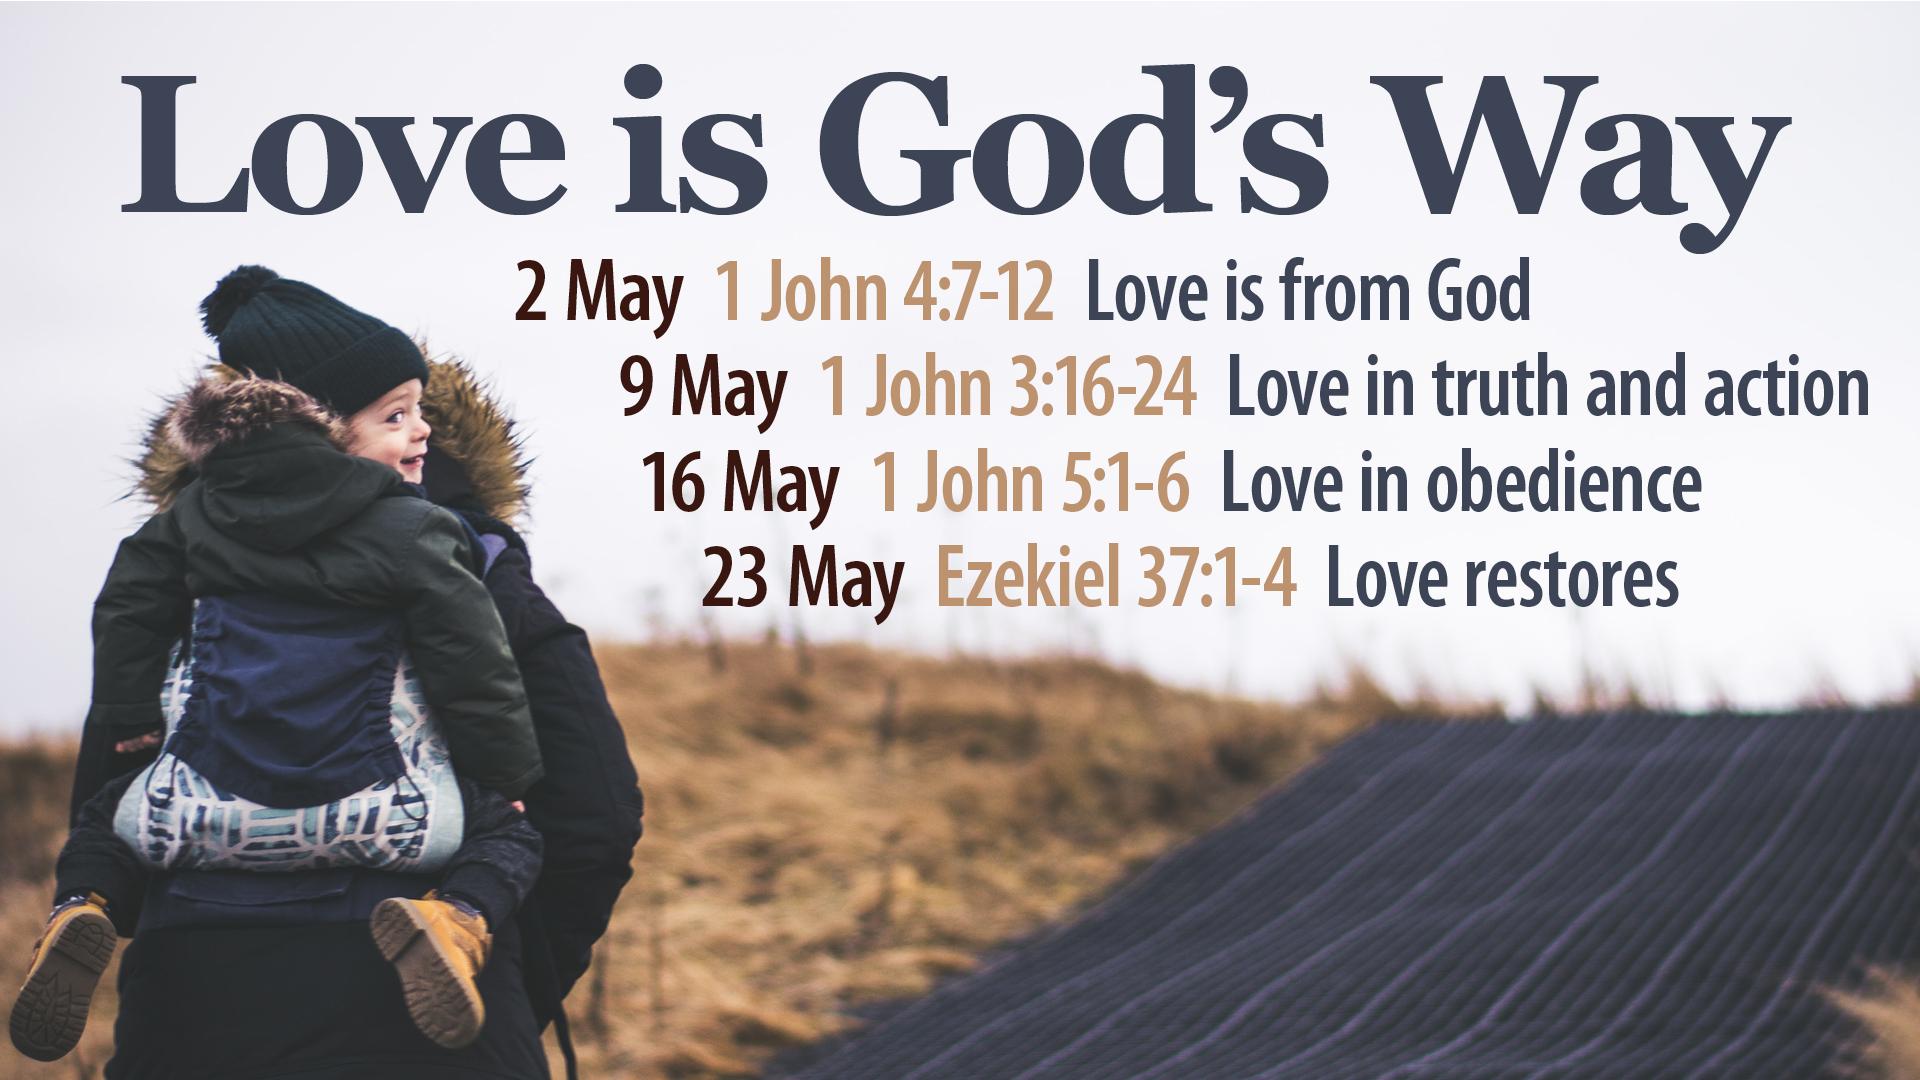 Love is God's Way